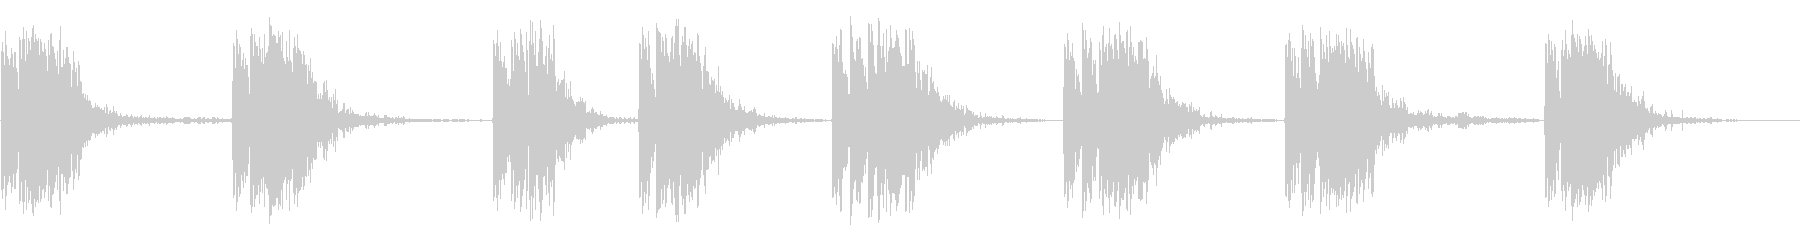 RUGER MINI 14、.22...の未再生の波形